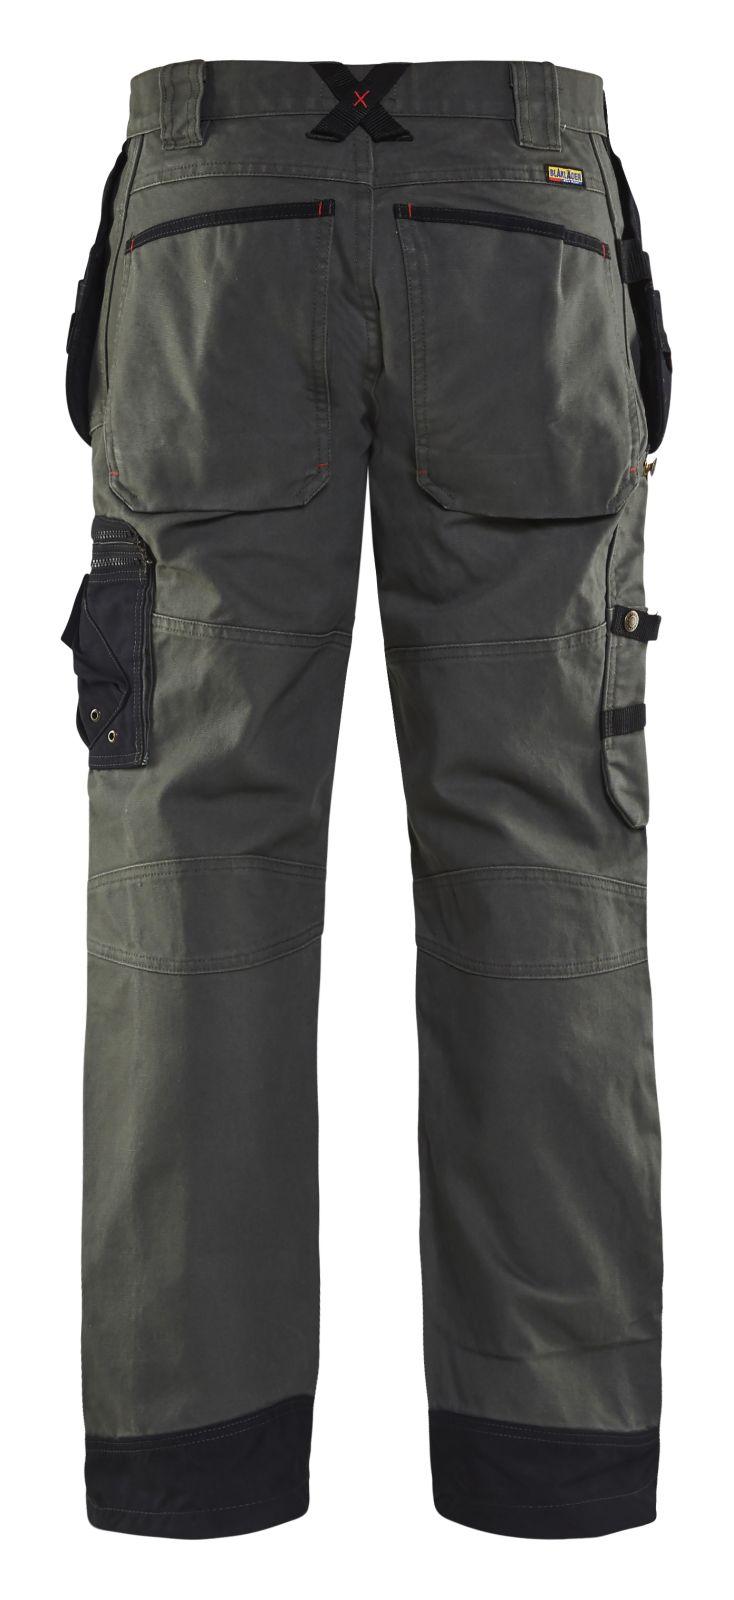 Blaklader Broeken 15001320 army groen-zwart(4699)